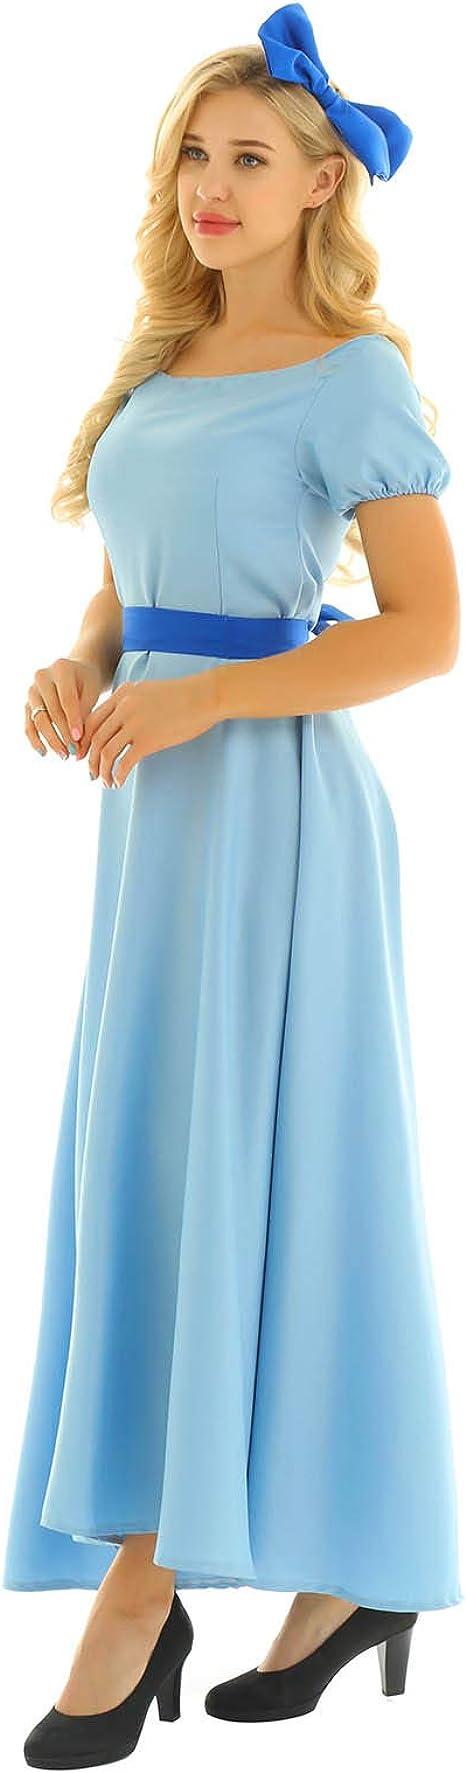 iiniim Vestido Wendy Mujer Vestido de Princesa Largo Azul Manga ...